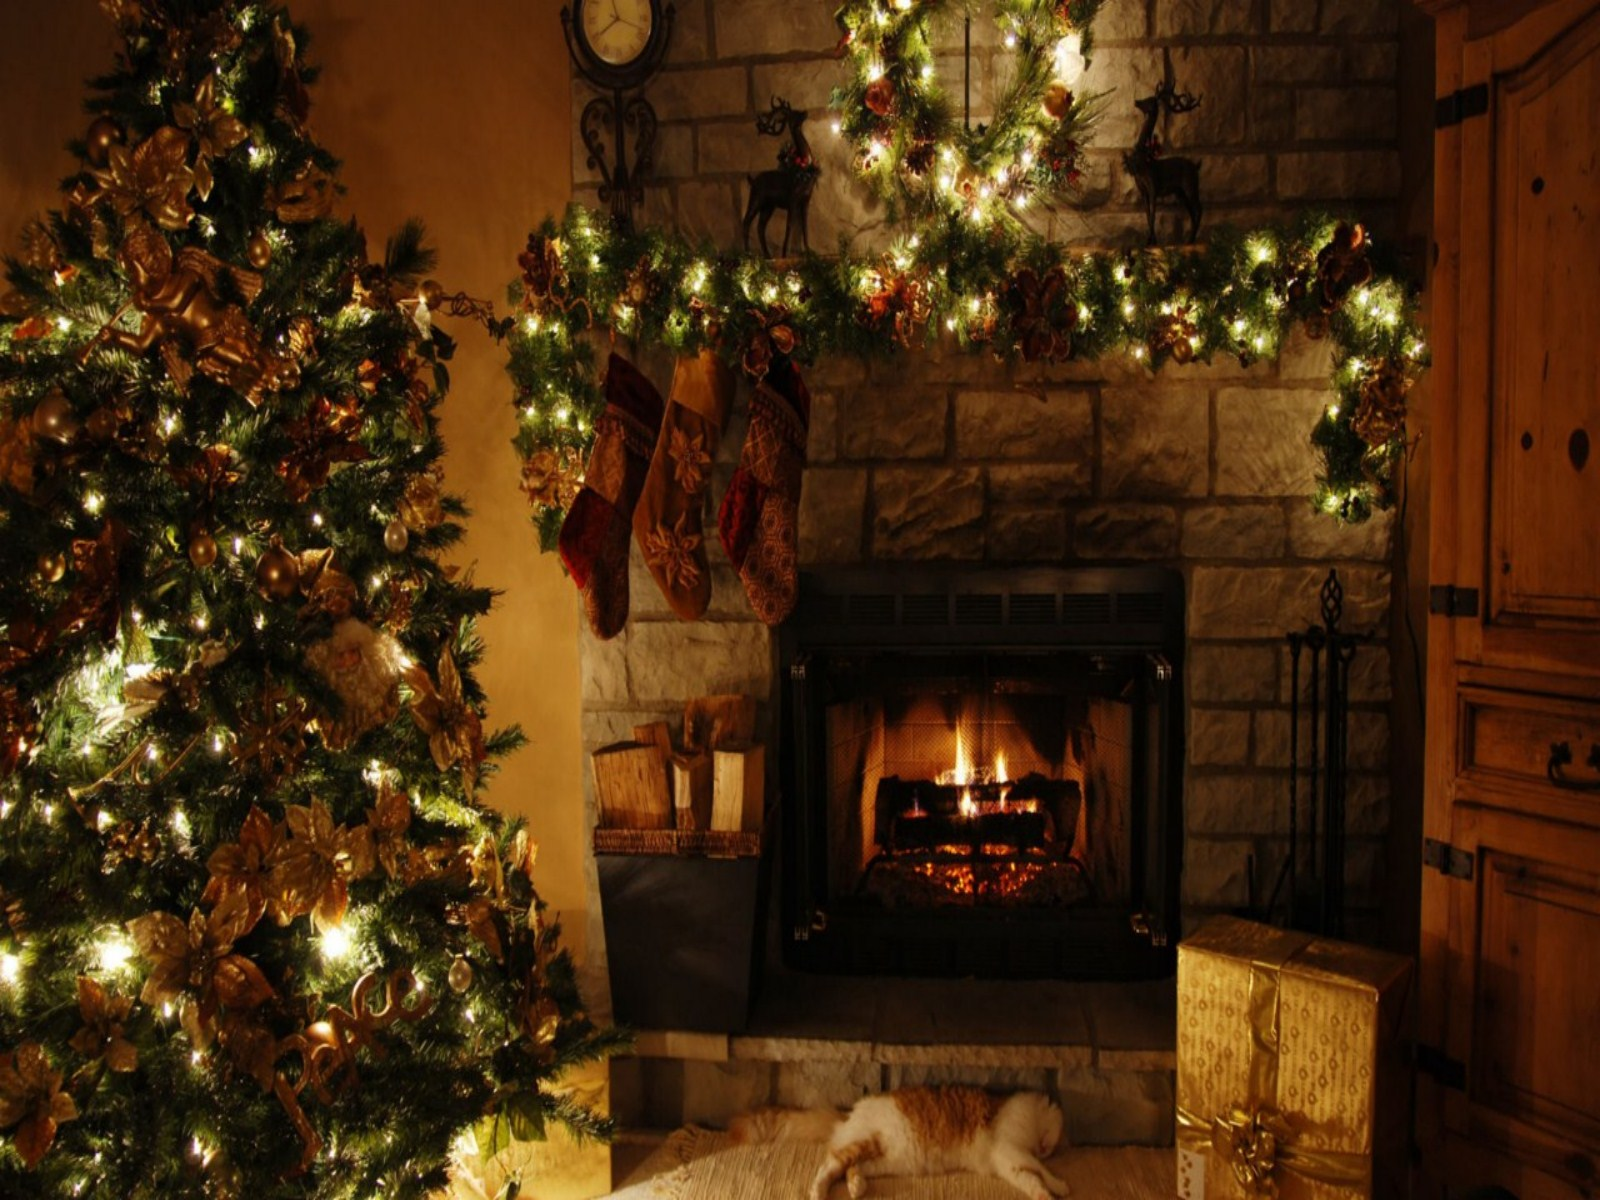 Christmas Fireplace Background Wallpaper   1600x1200   379363 1600x1200